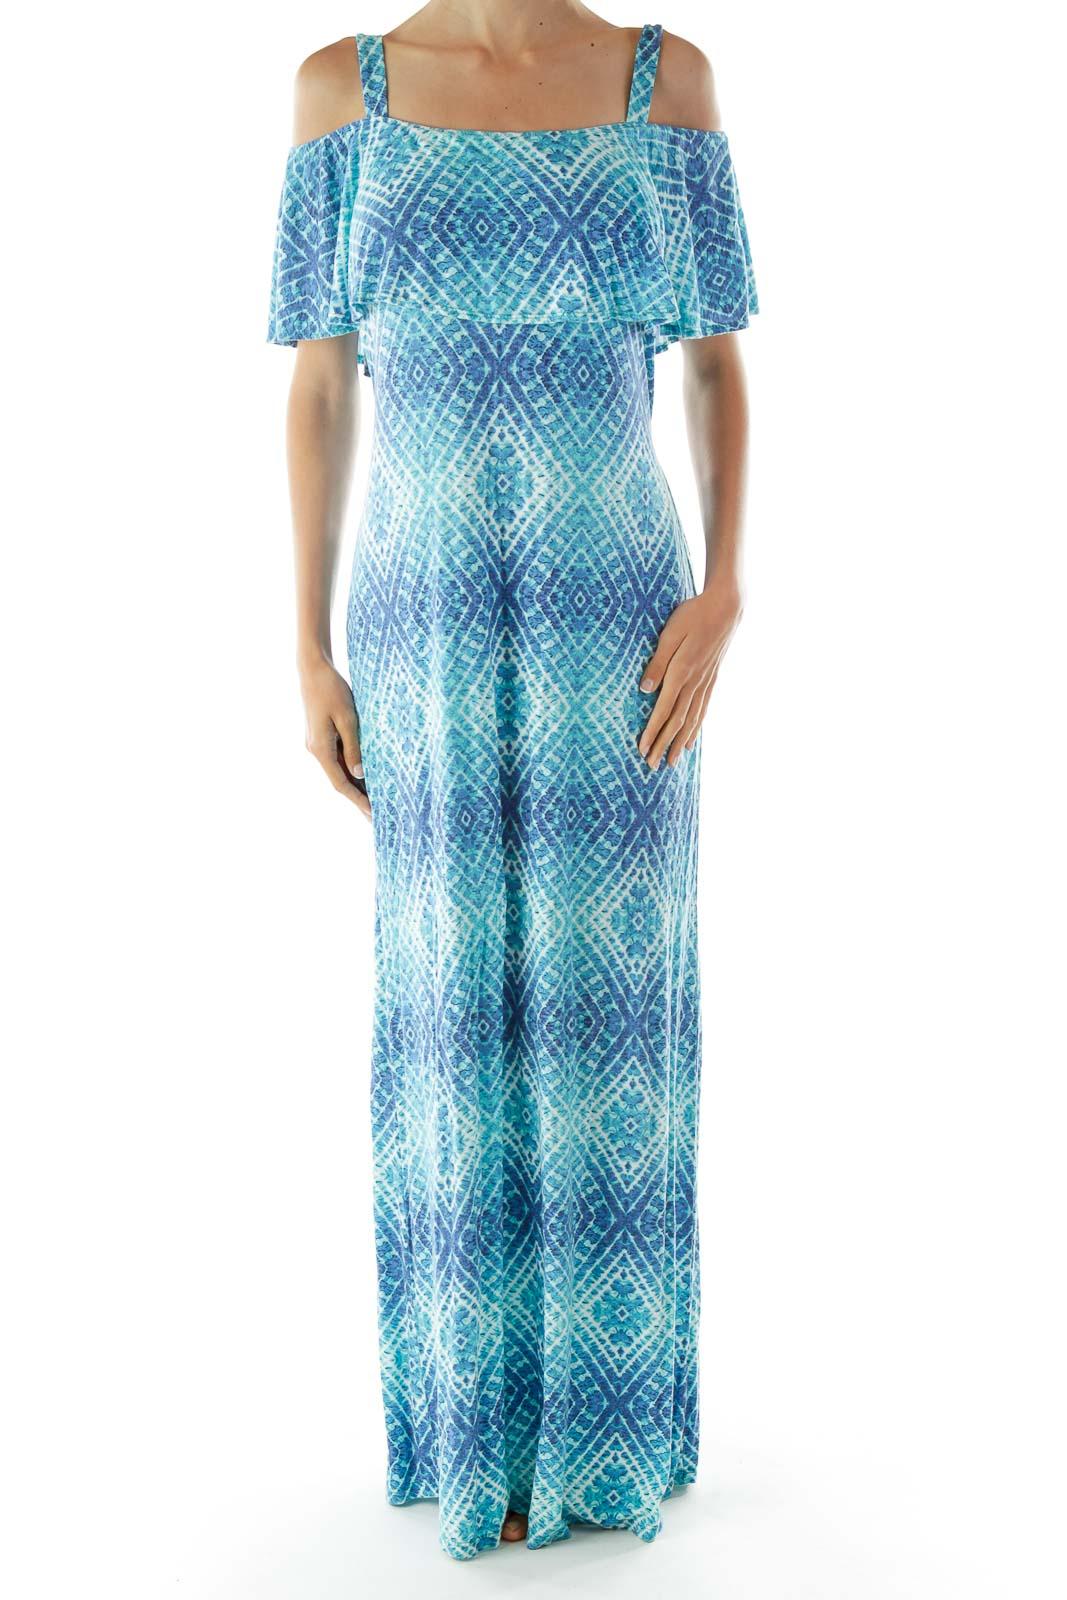 Blue White Tie Dye Cold Shoulder Day Dress Front